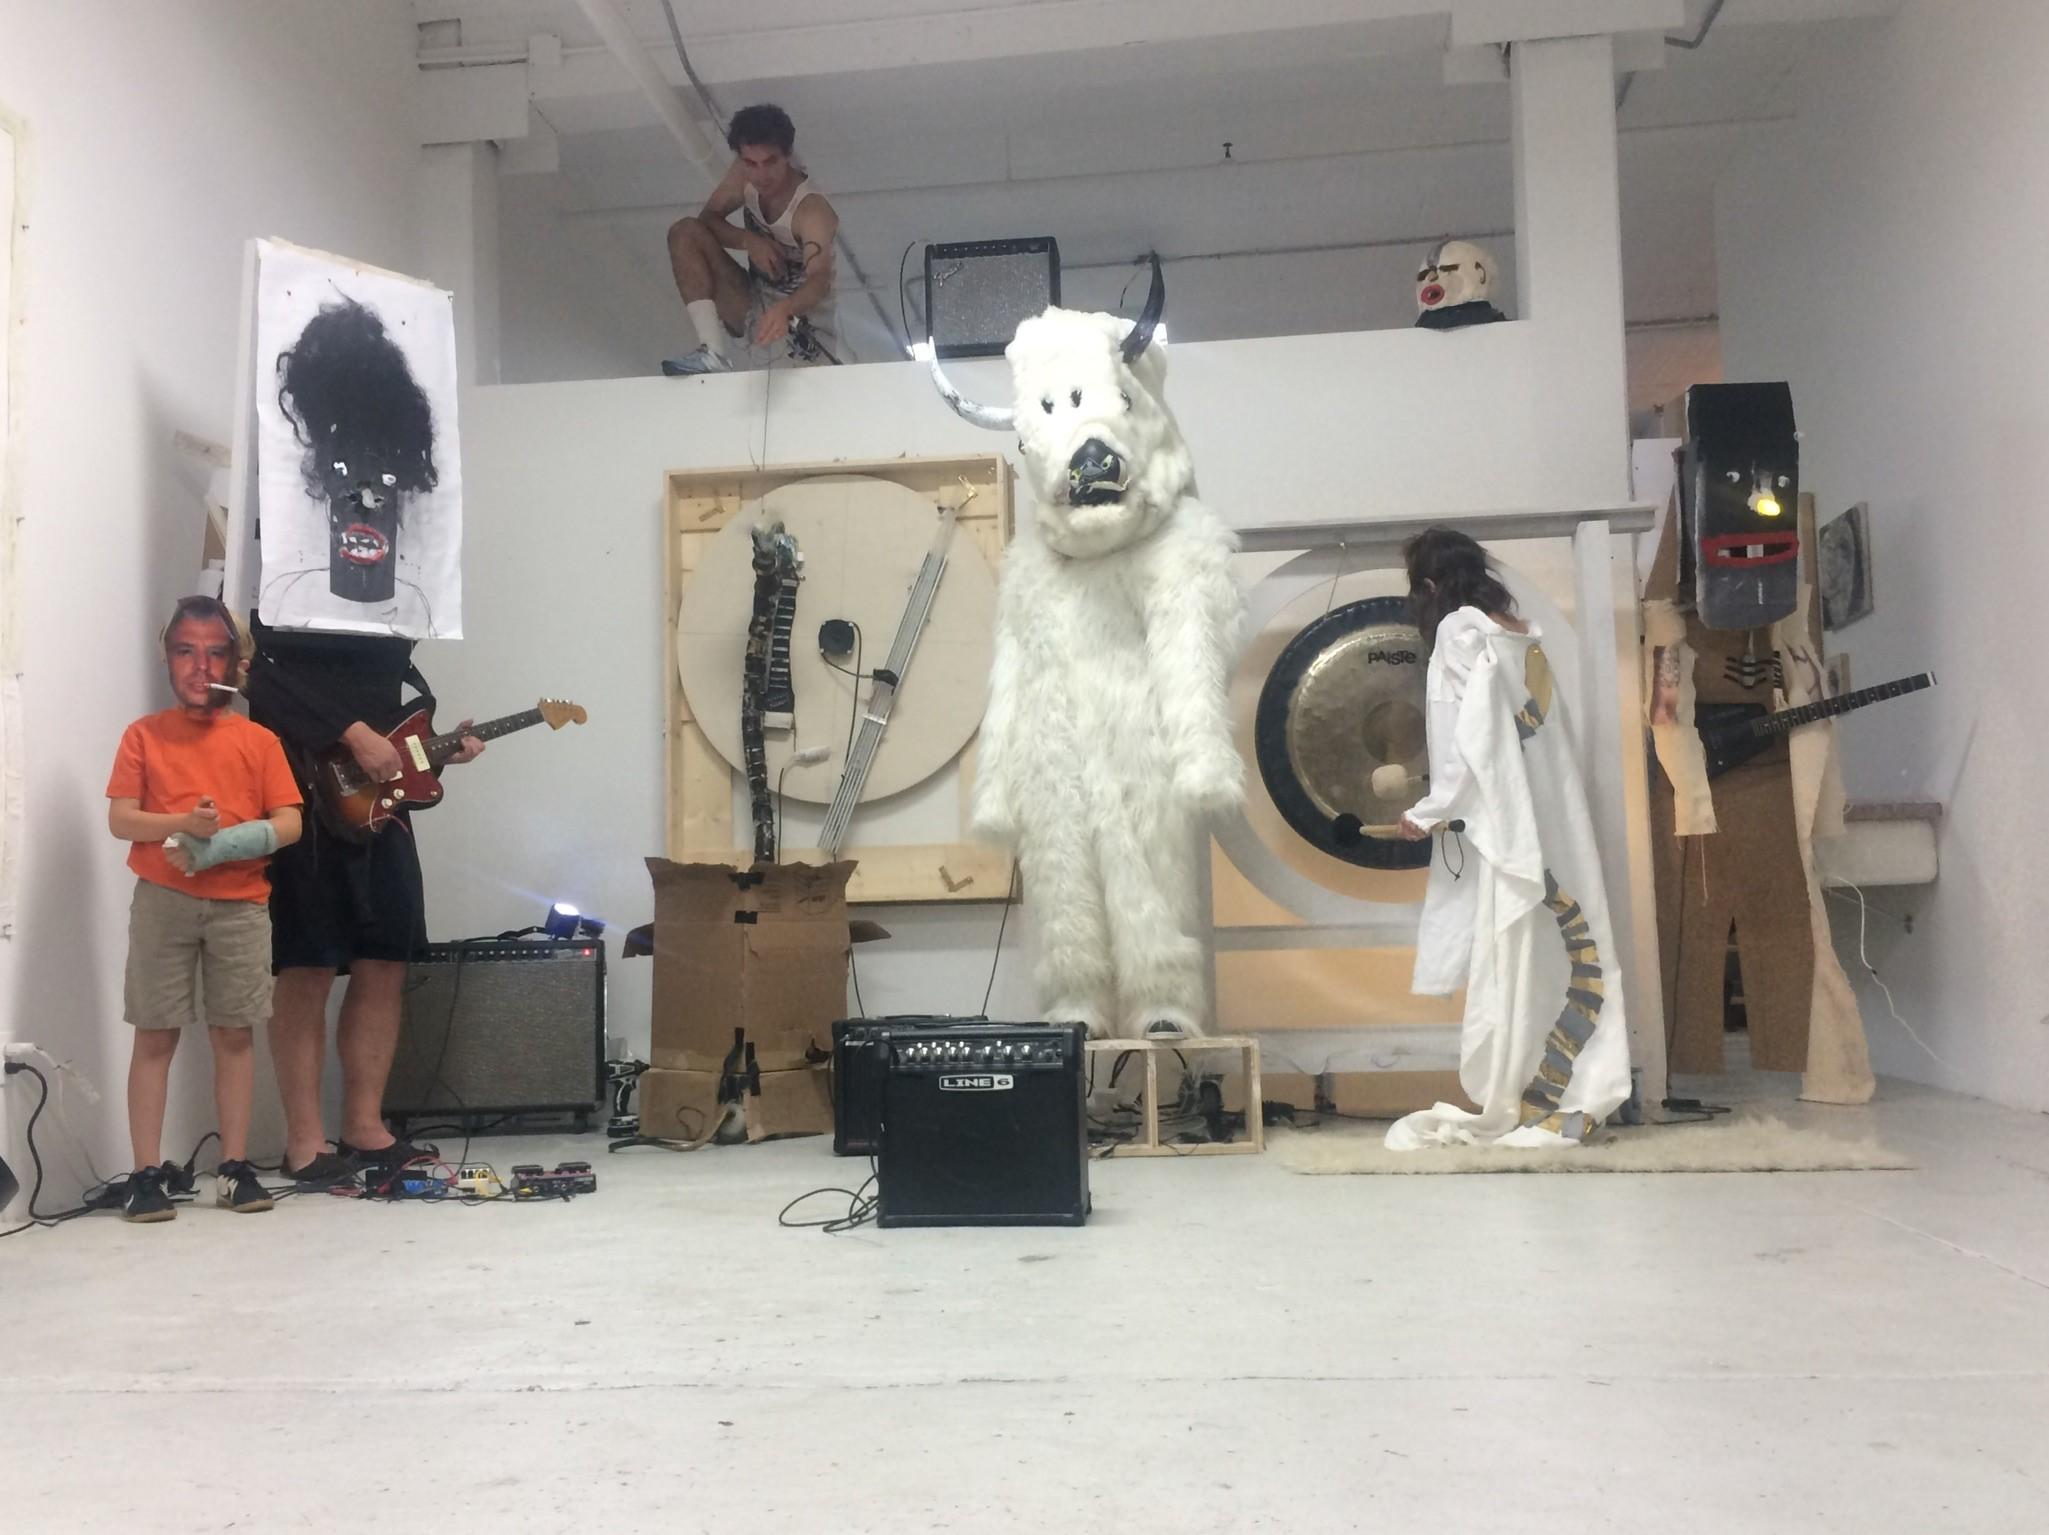 Dan Bainbridge's performance accompanying his exhibition  Bestiary , ART3 Gallery, Brooklyn, NY, June 13, 2015 © Dan Bainbridge 2015, photo Monika Fabijanska